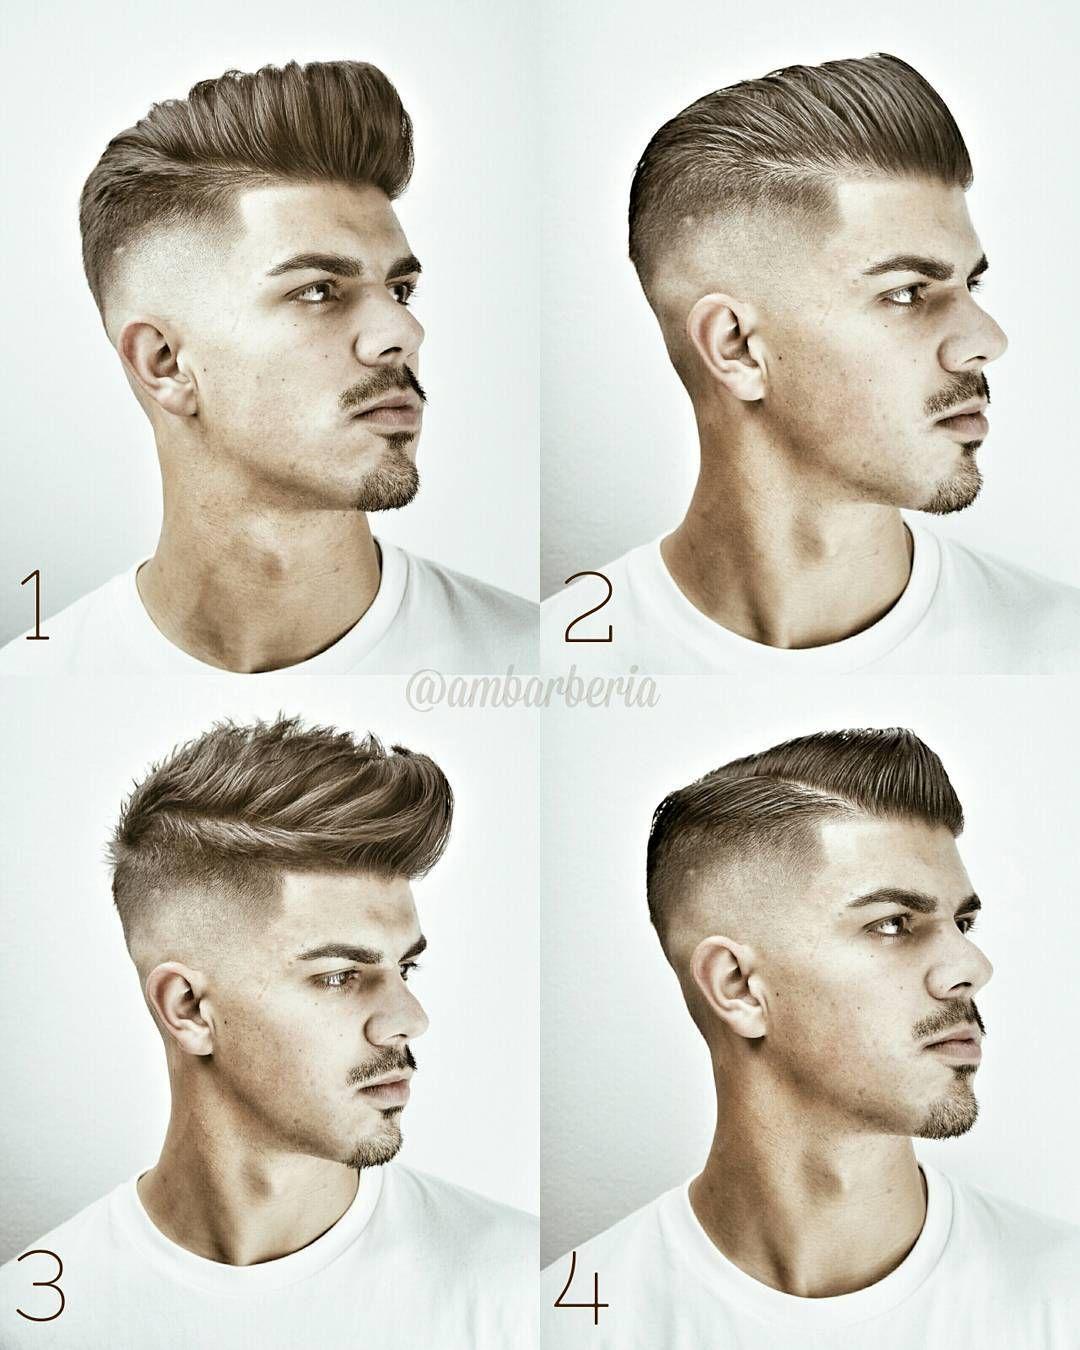 Buzz cut haircut men pin by eva labella on peinados hombre  pinterest  haircuts hair